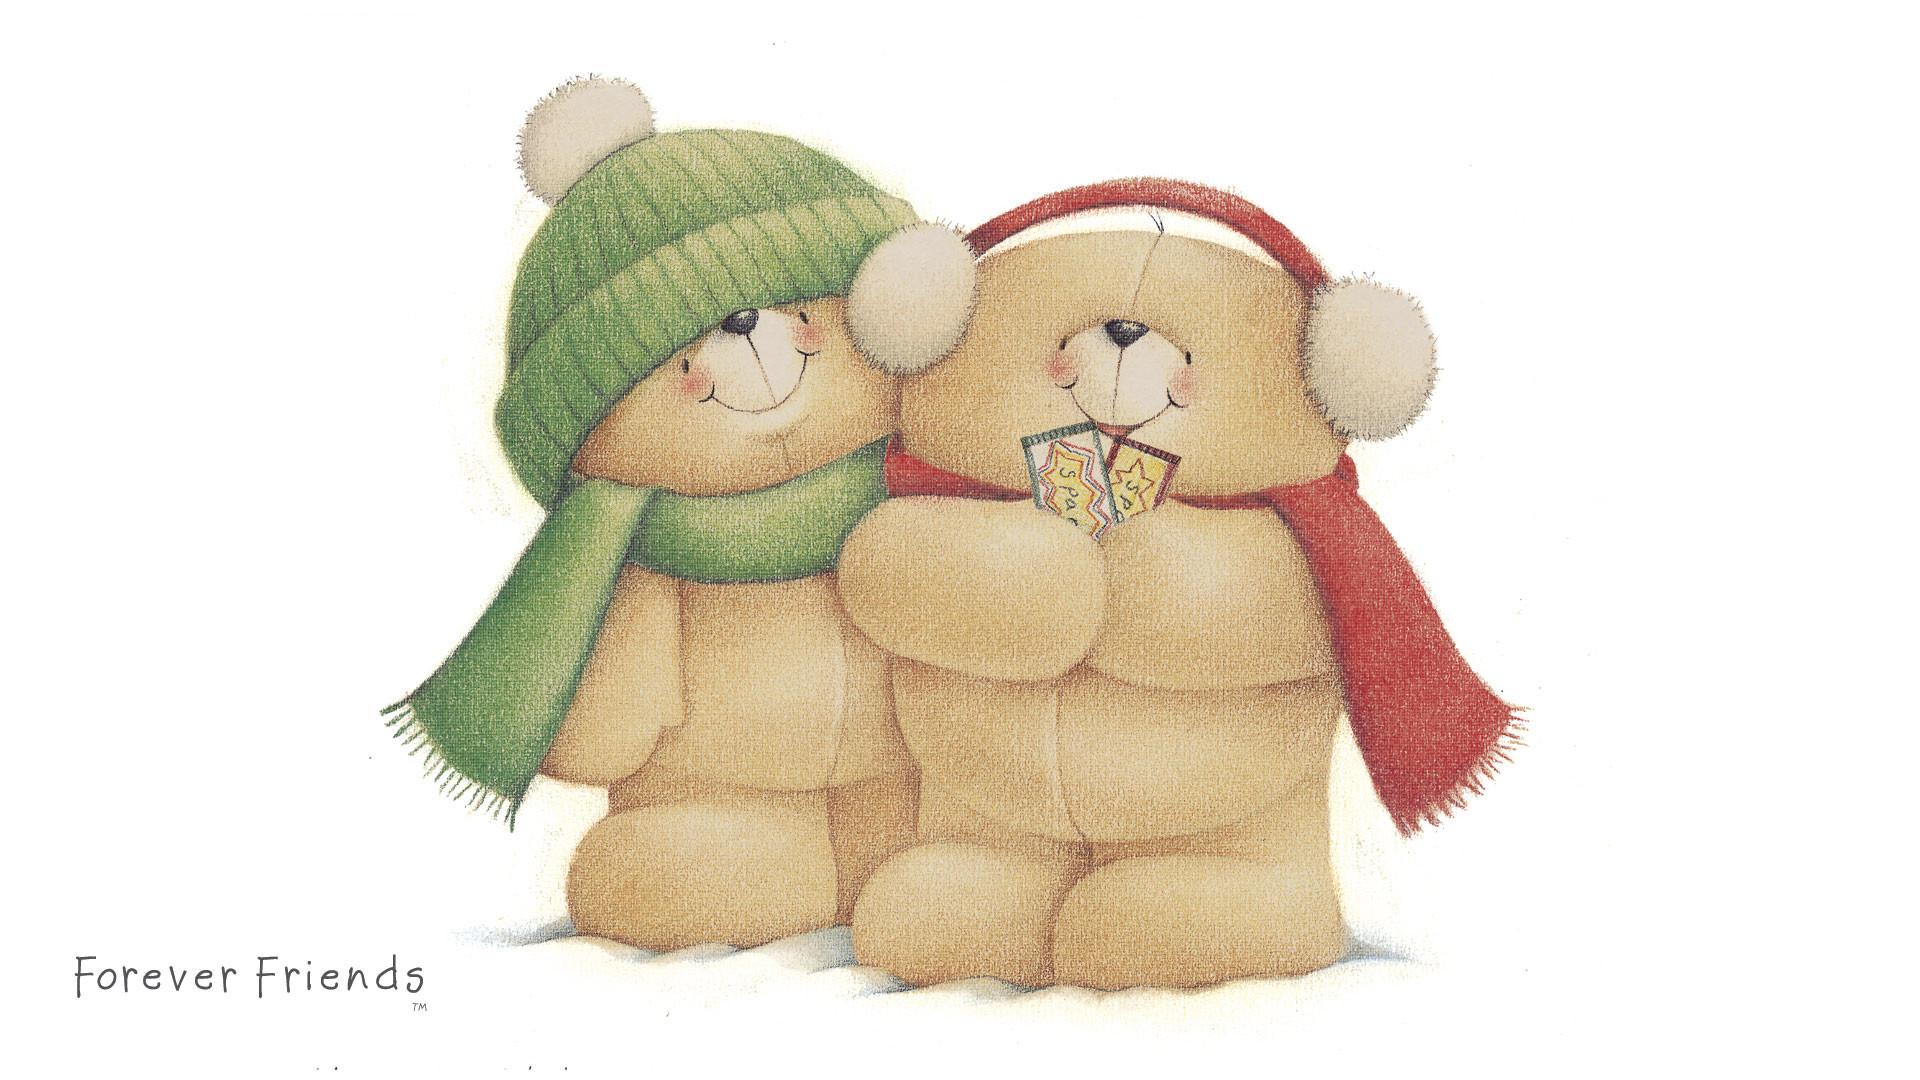 Cute Pooh Bear Wallpapers Teddy Bear Wallpaper And Screensavers 65 Images